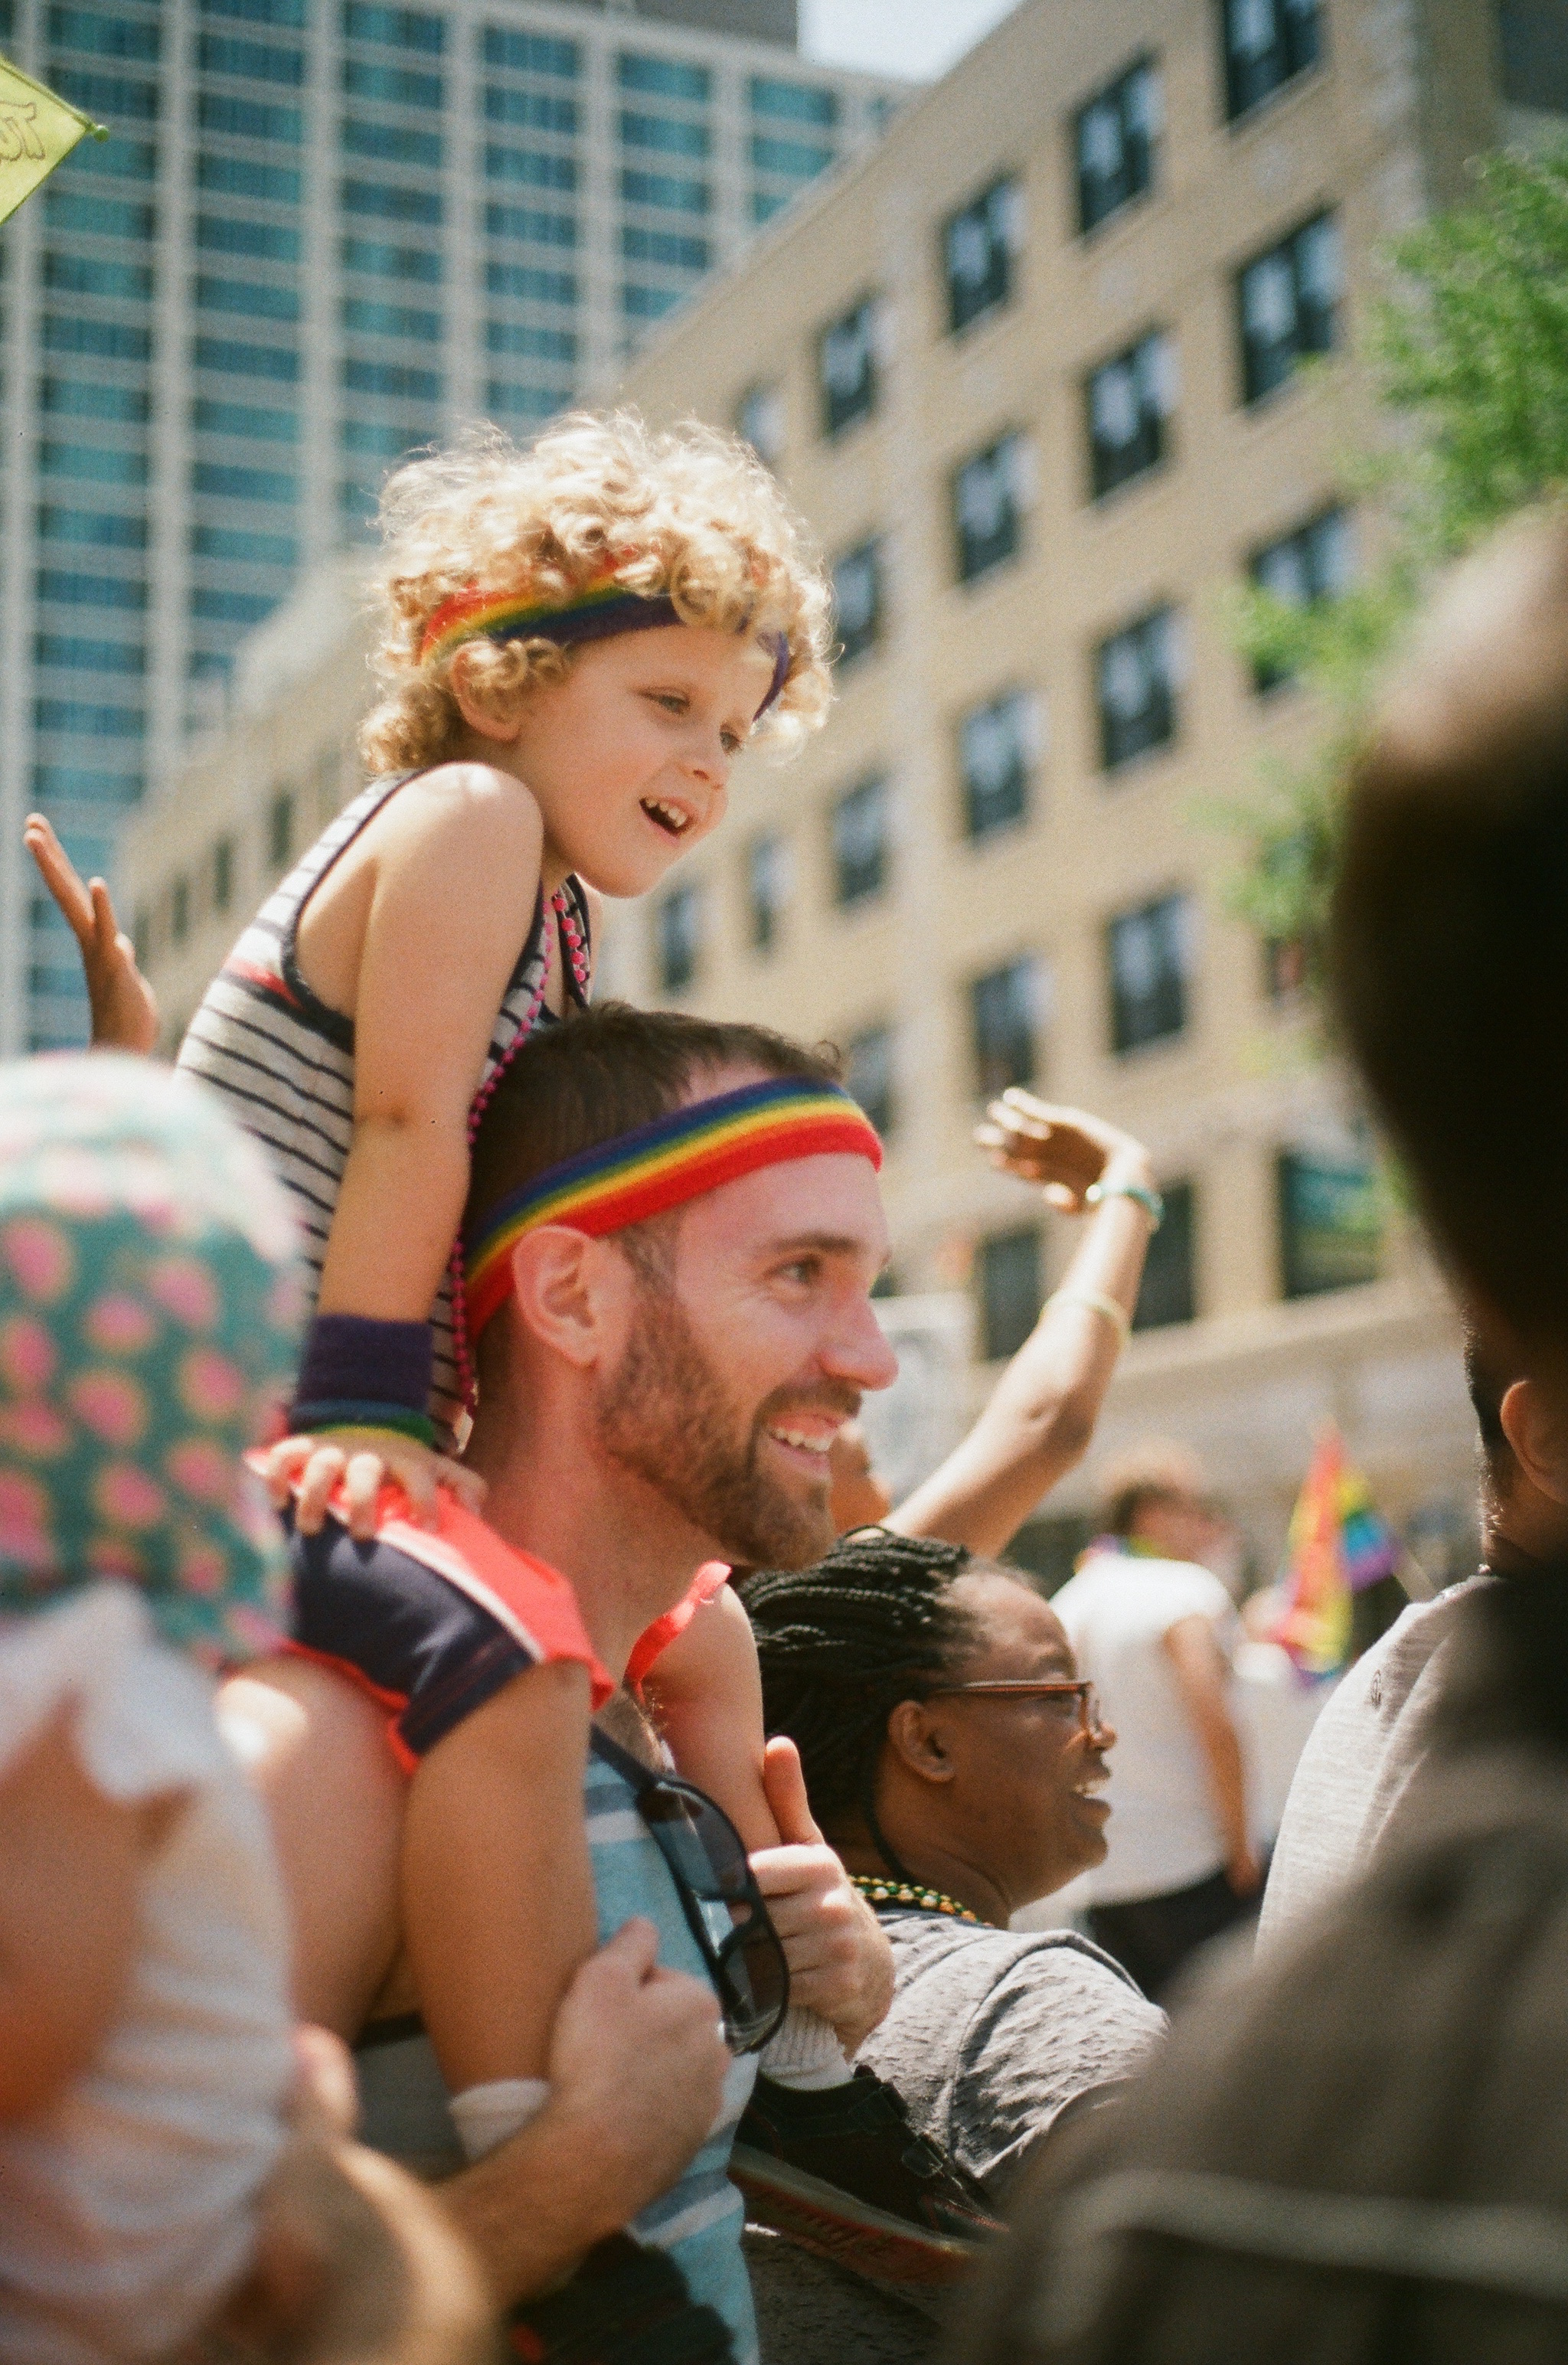 Chicago Pride Parade, 2018 35mm